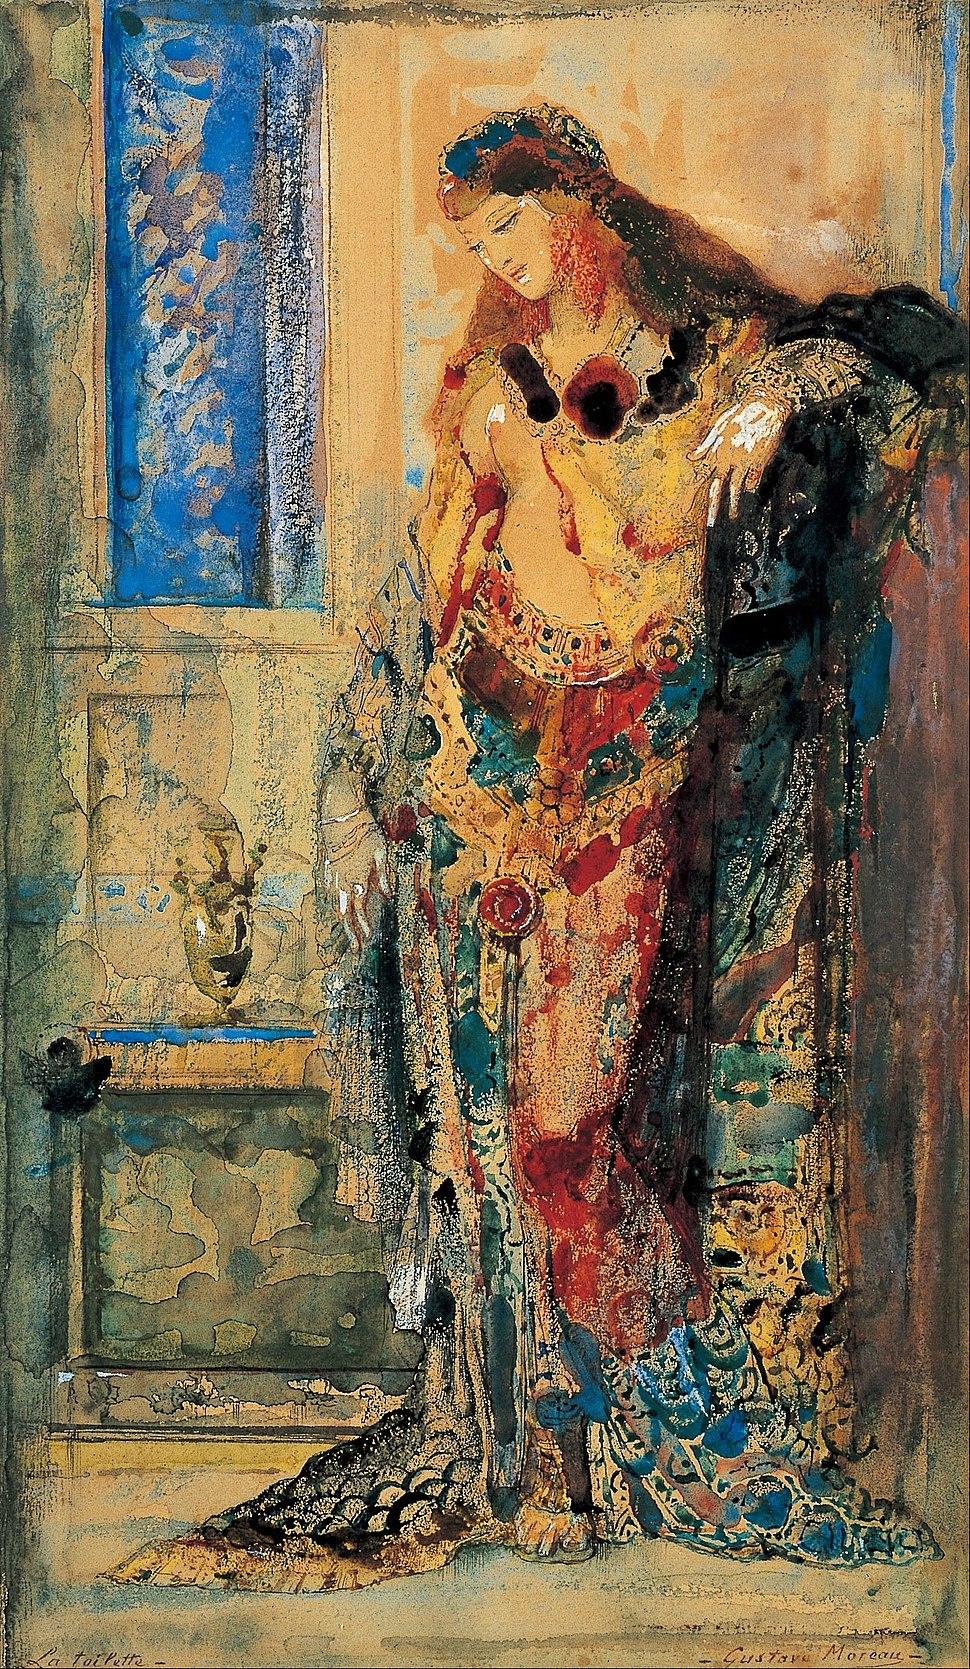 Gustave Moreau - The Toilette - Google Art Project